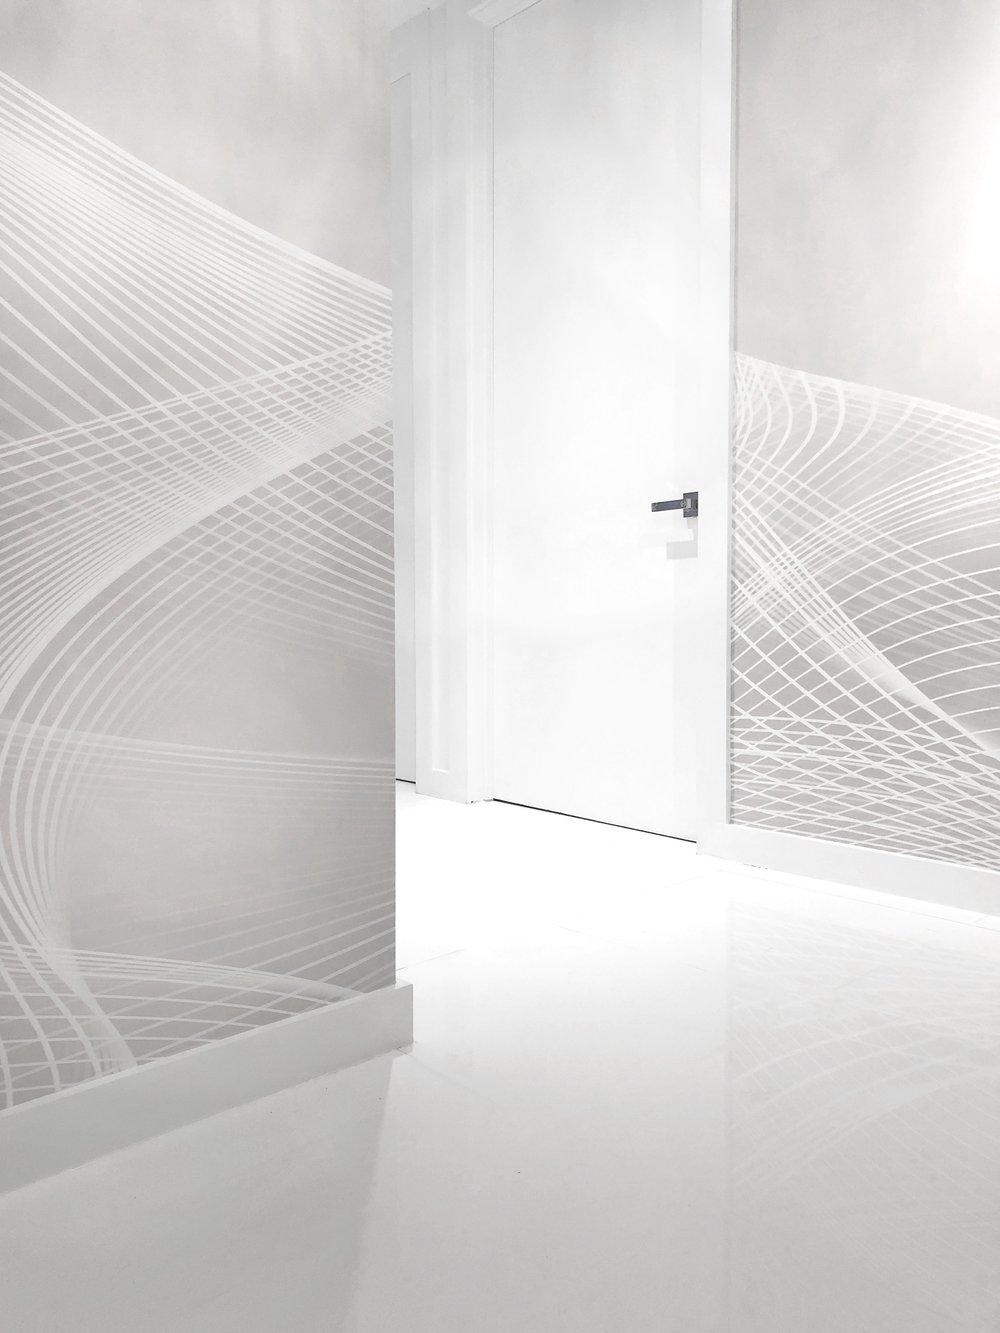 {l w l} In Guggenheim grey, linen textured Type II wallcovering